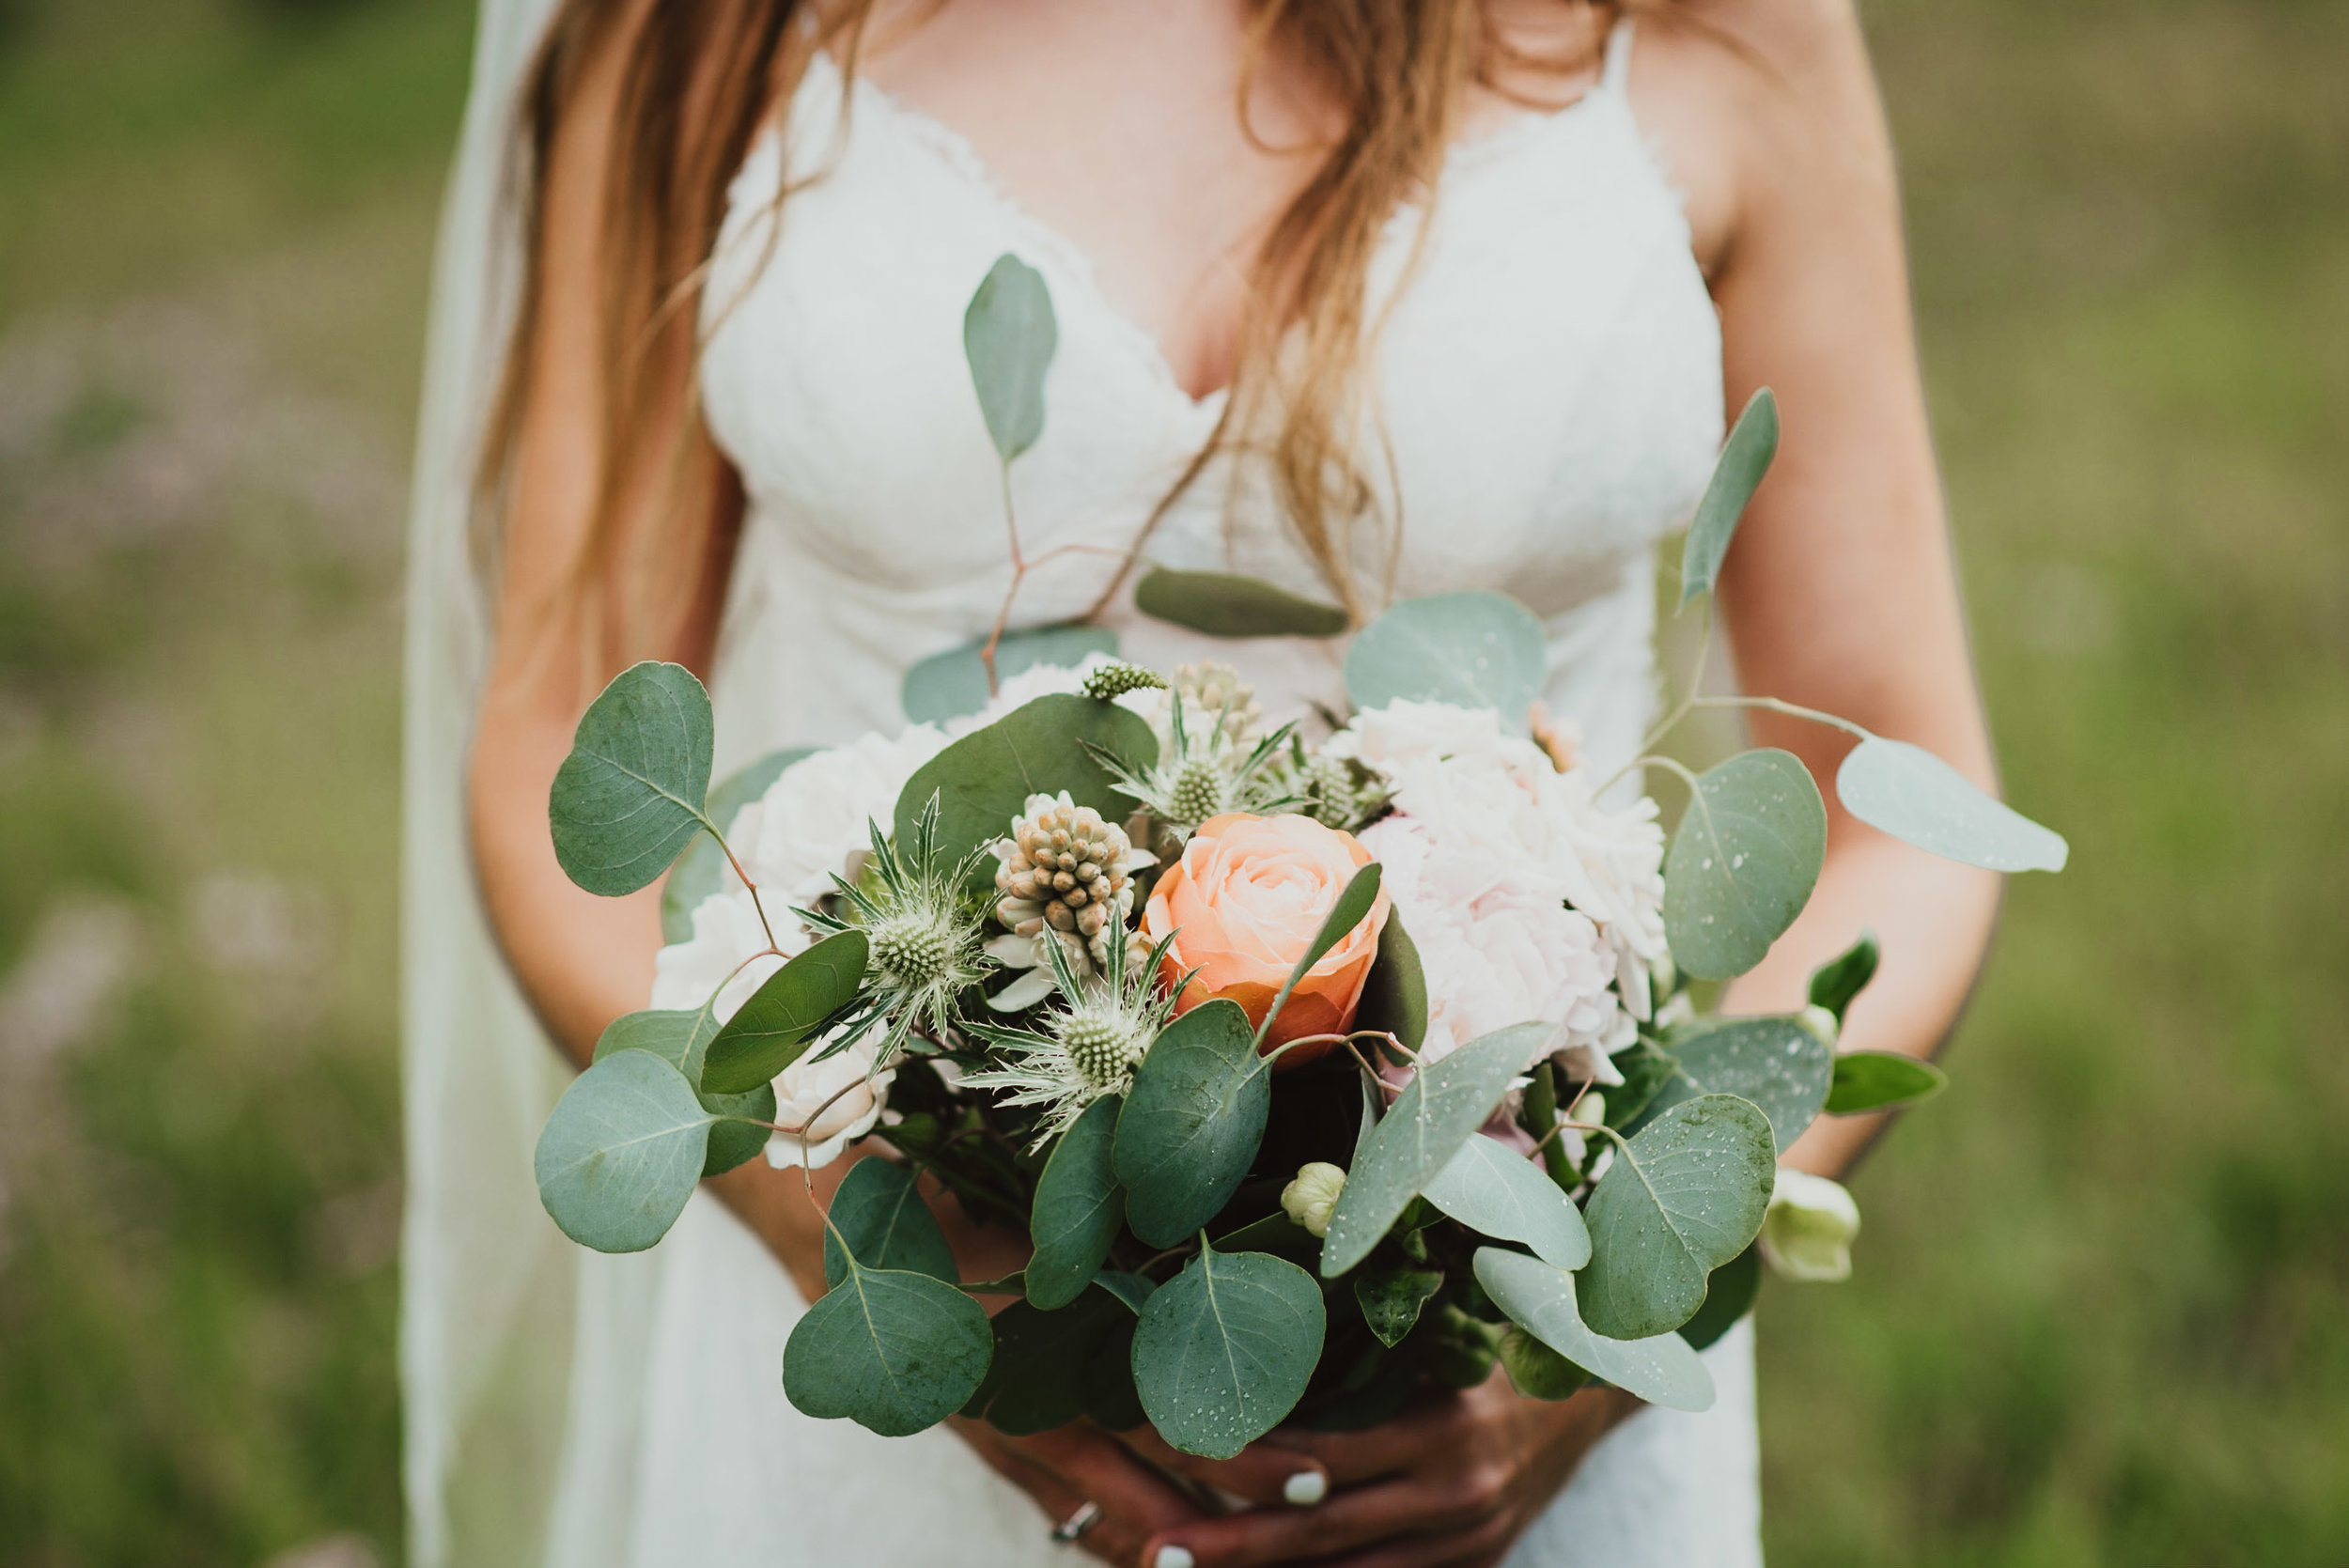 Heather's wedding flowers.